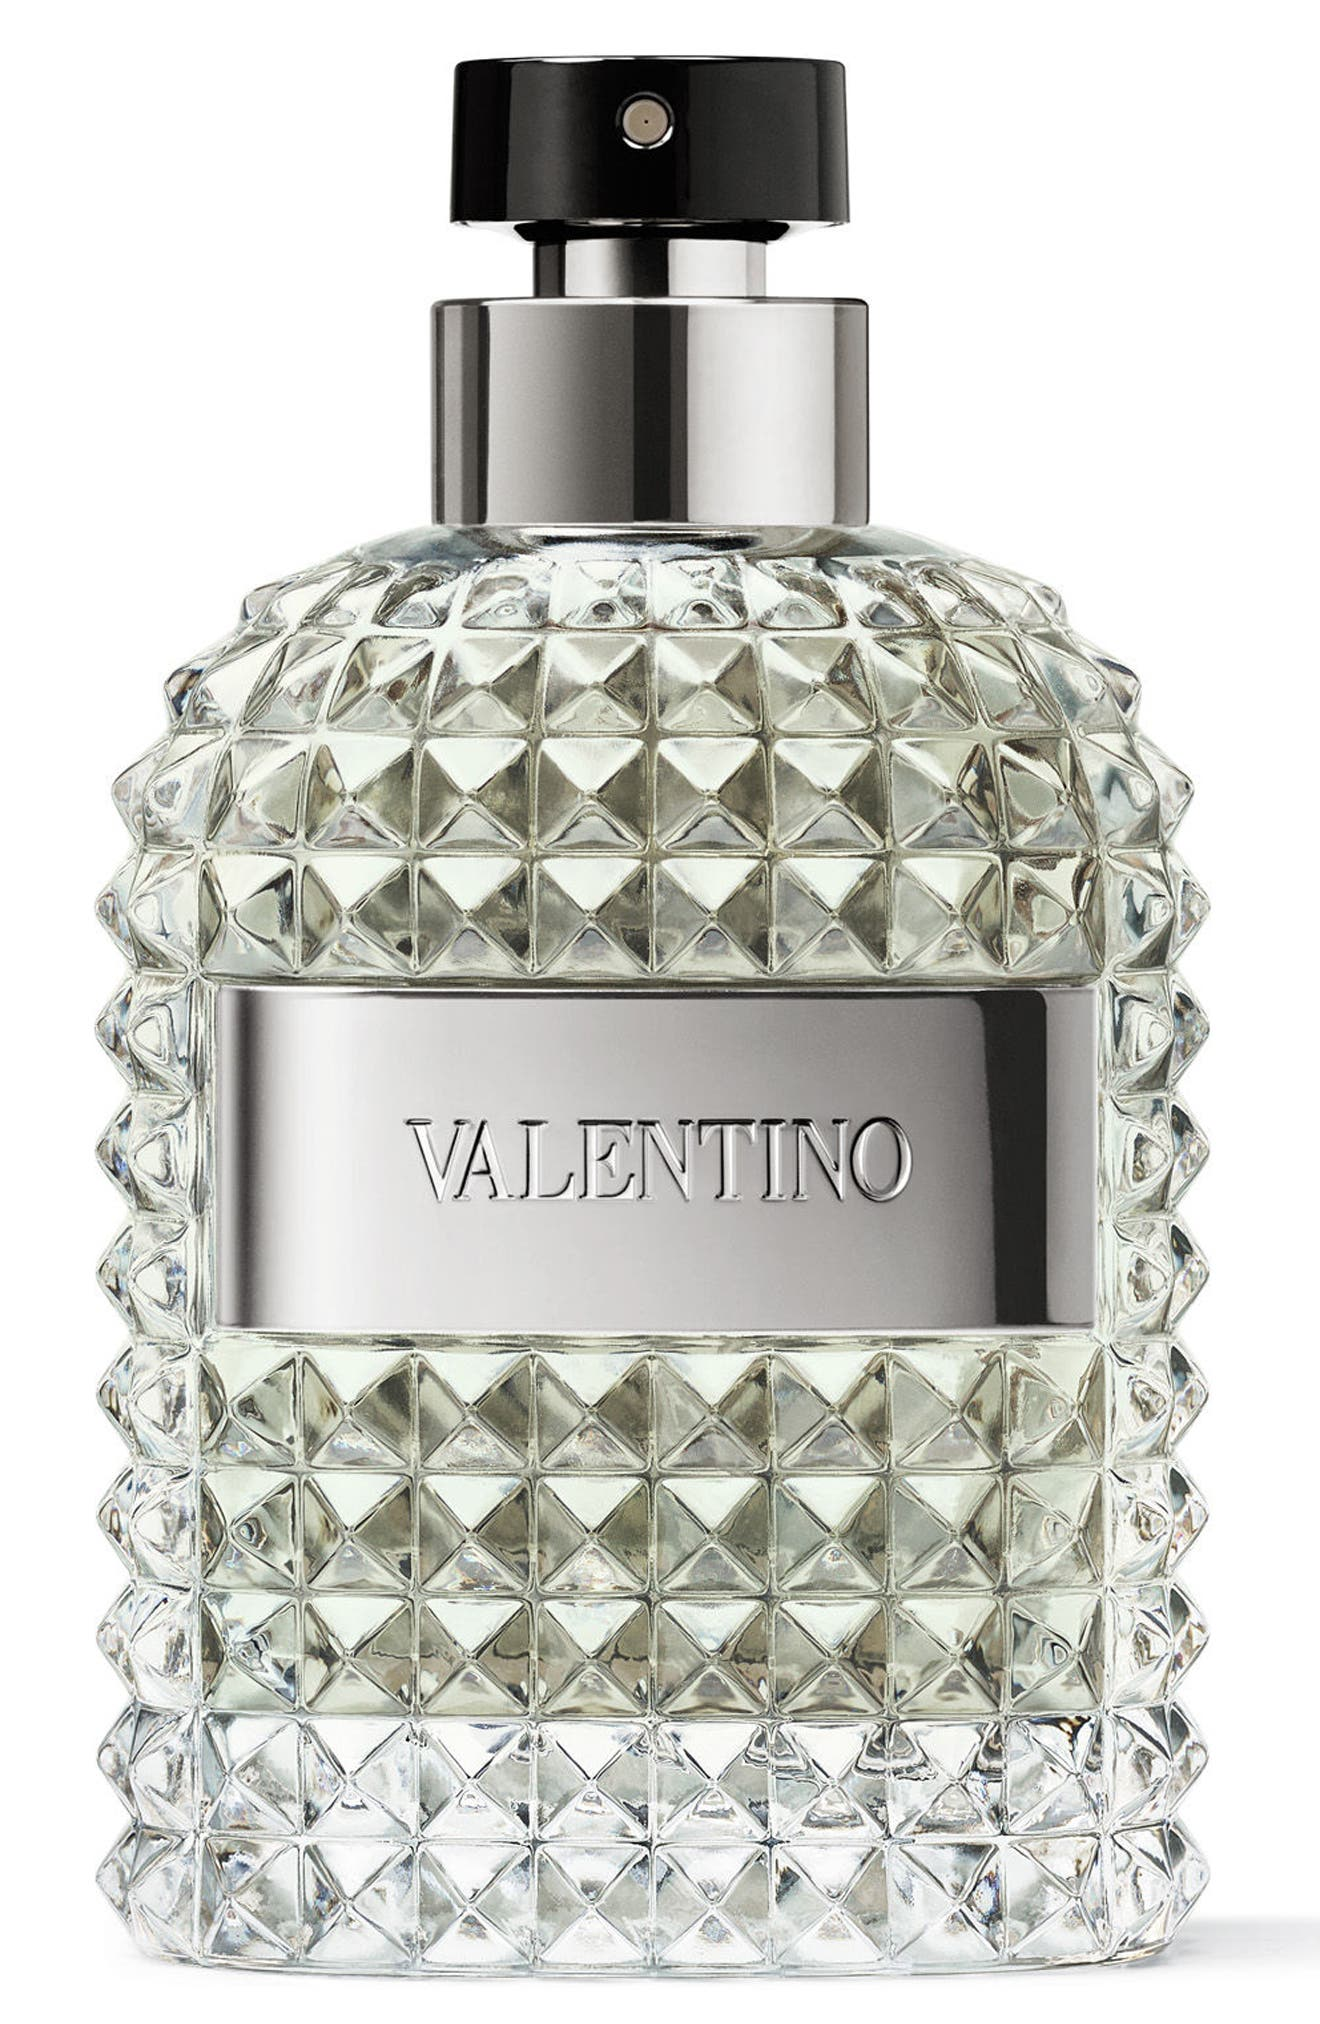 Main Image - Valentino Uomo Acqua Eau de Toilette (Nordstrom Exclusive)